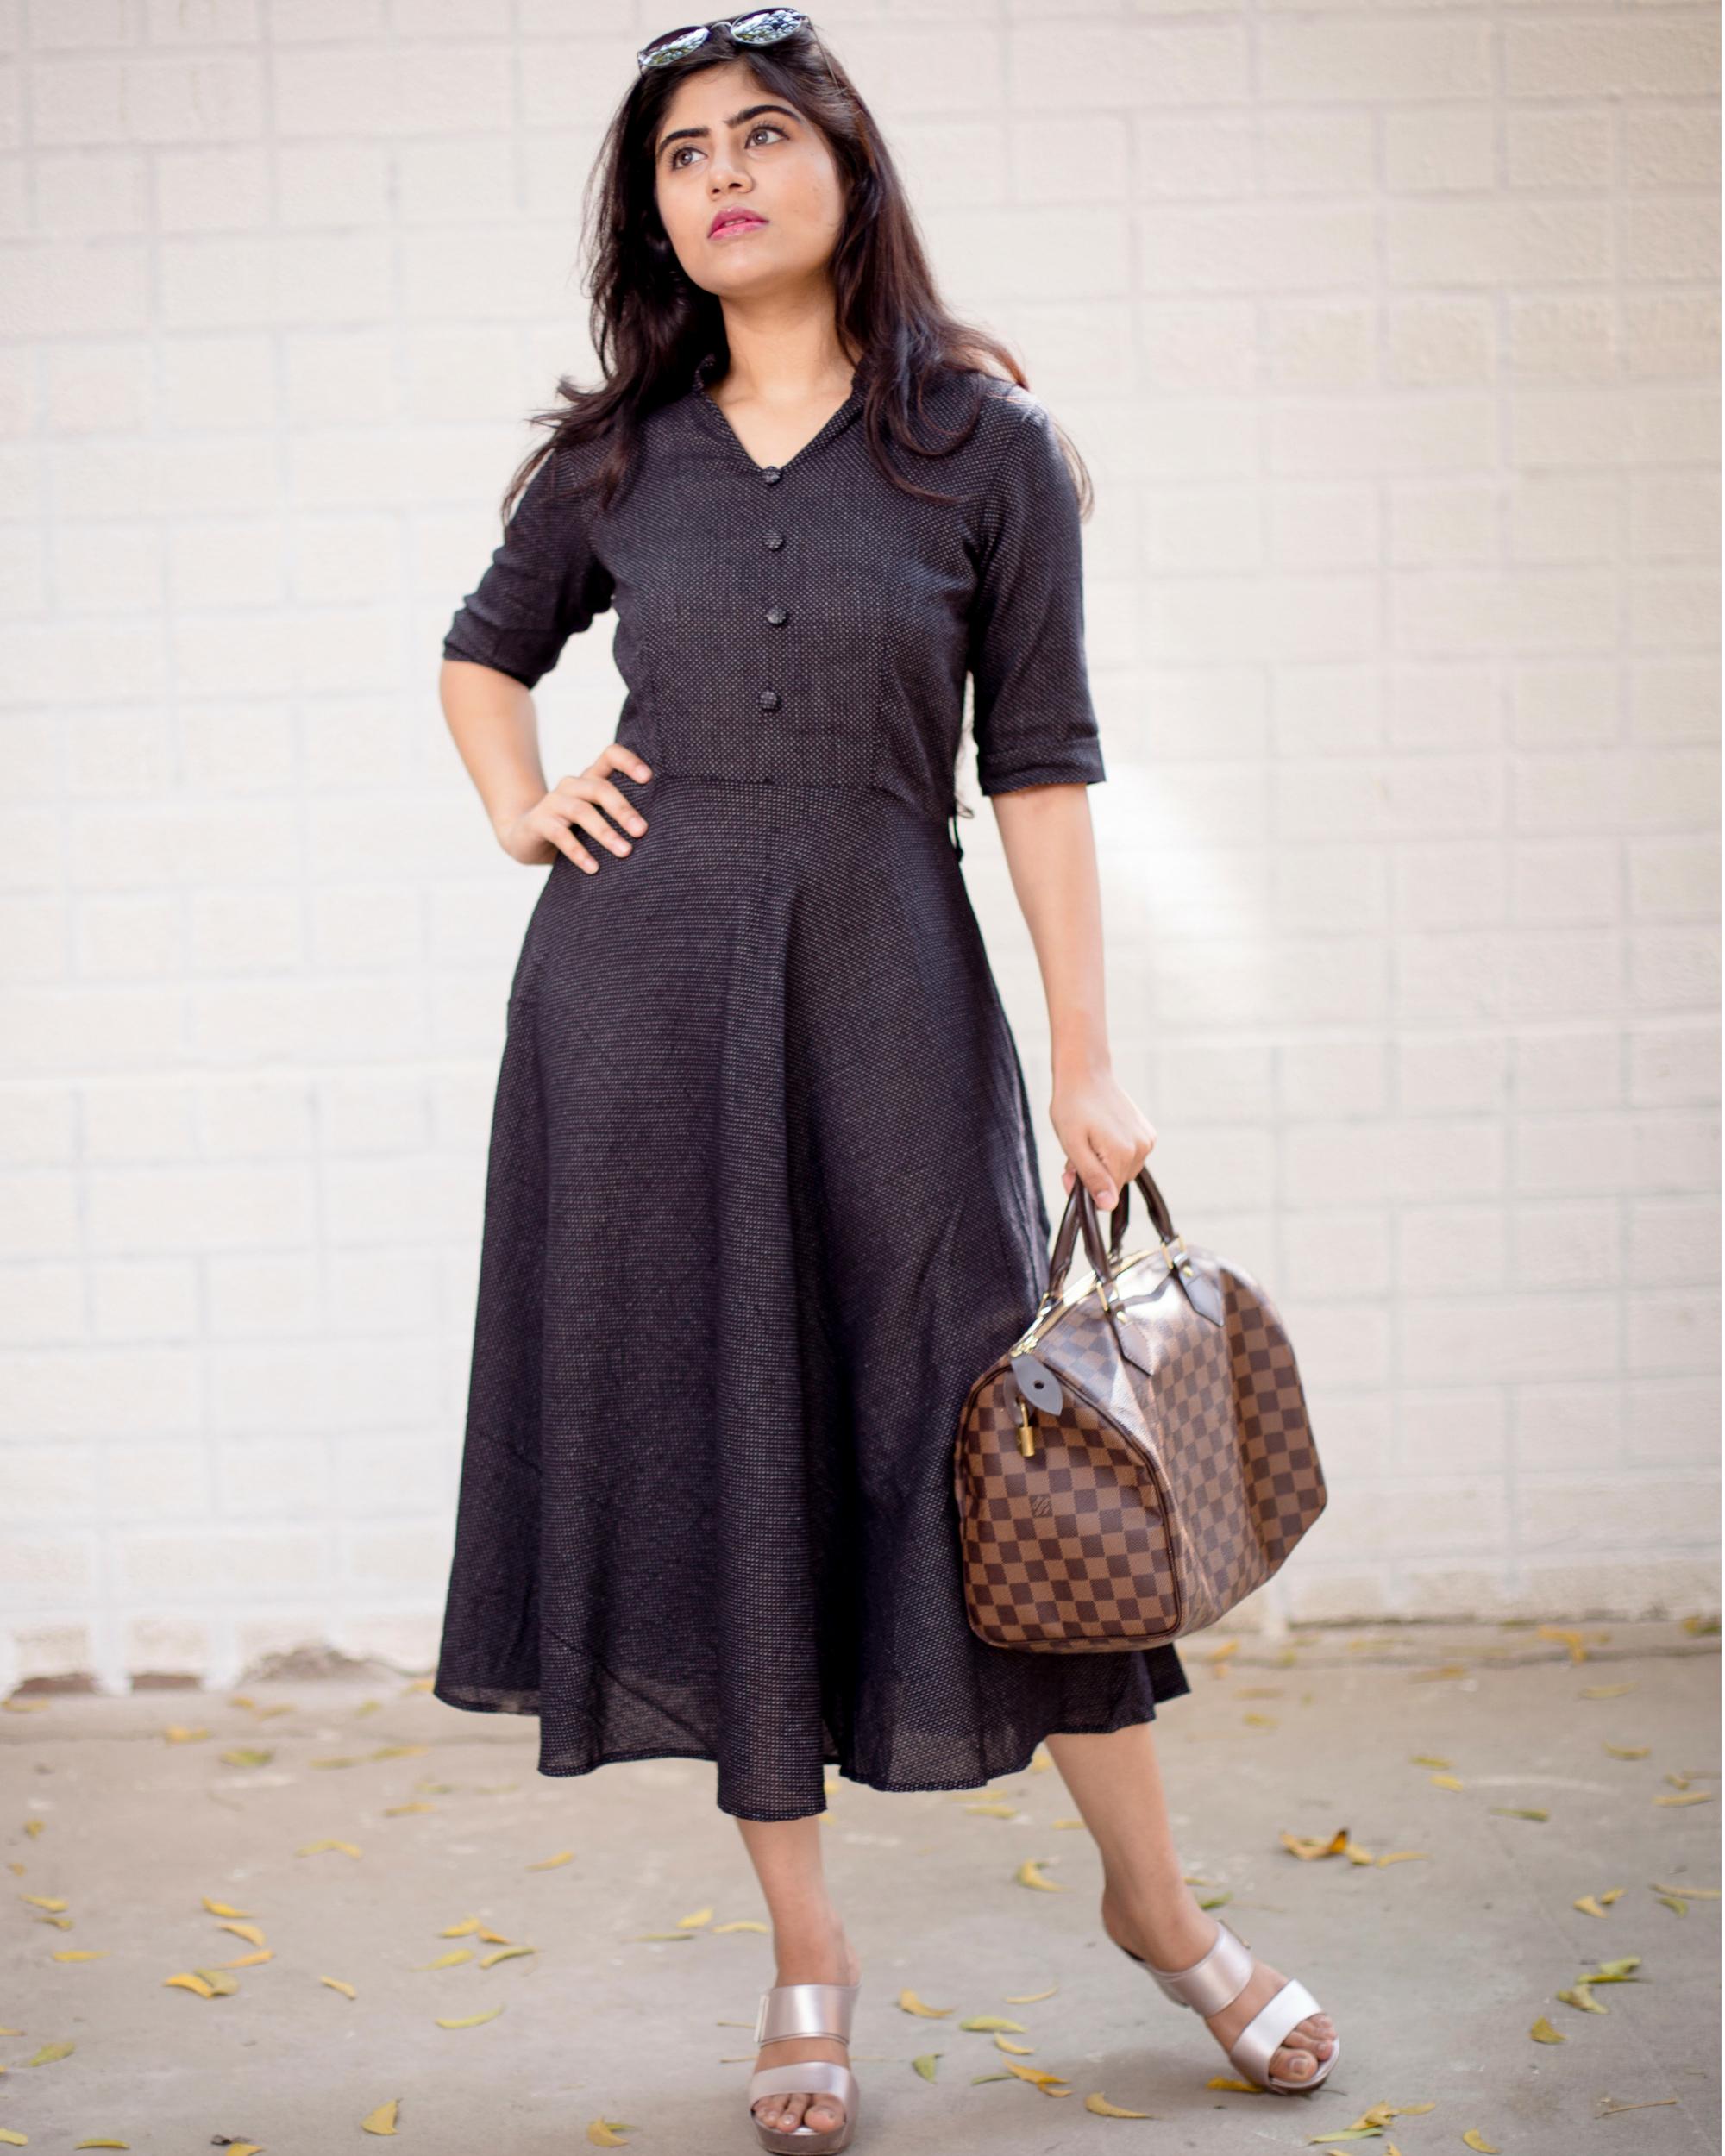 Black buttoned midi flared dress